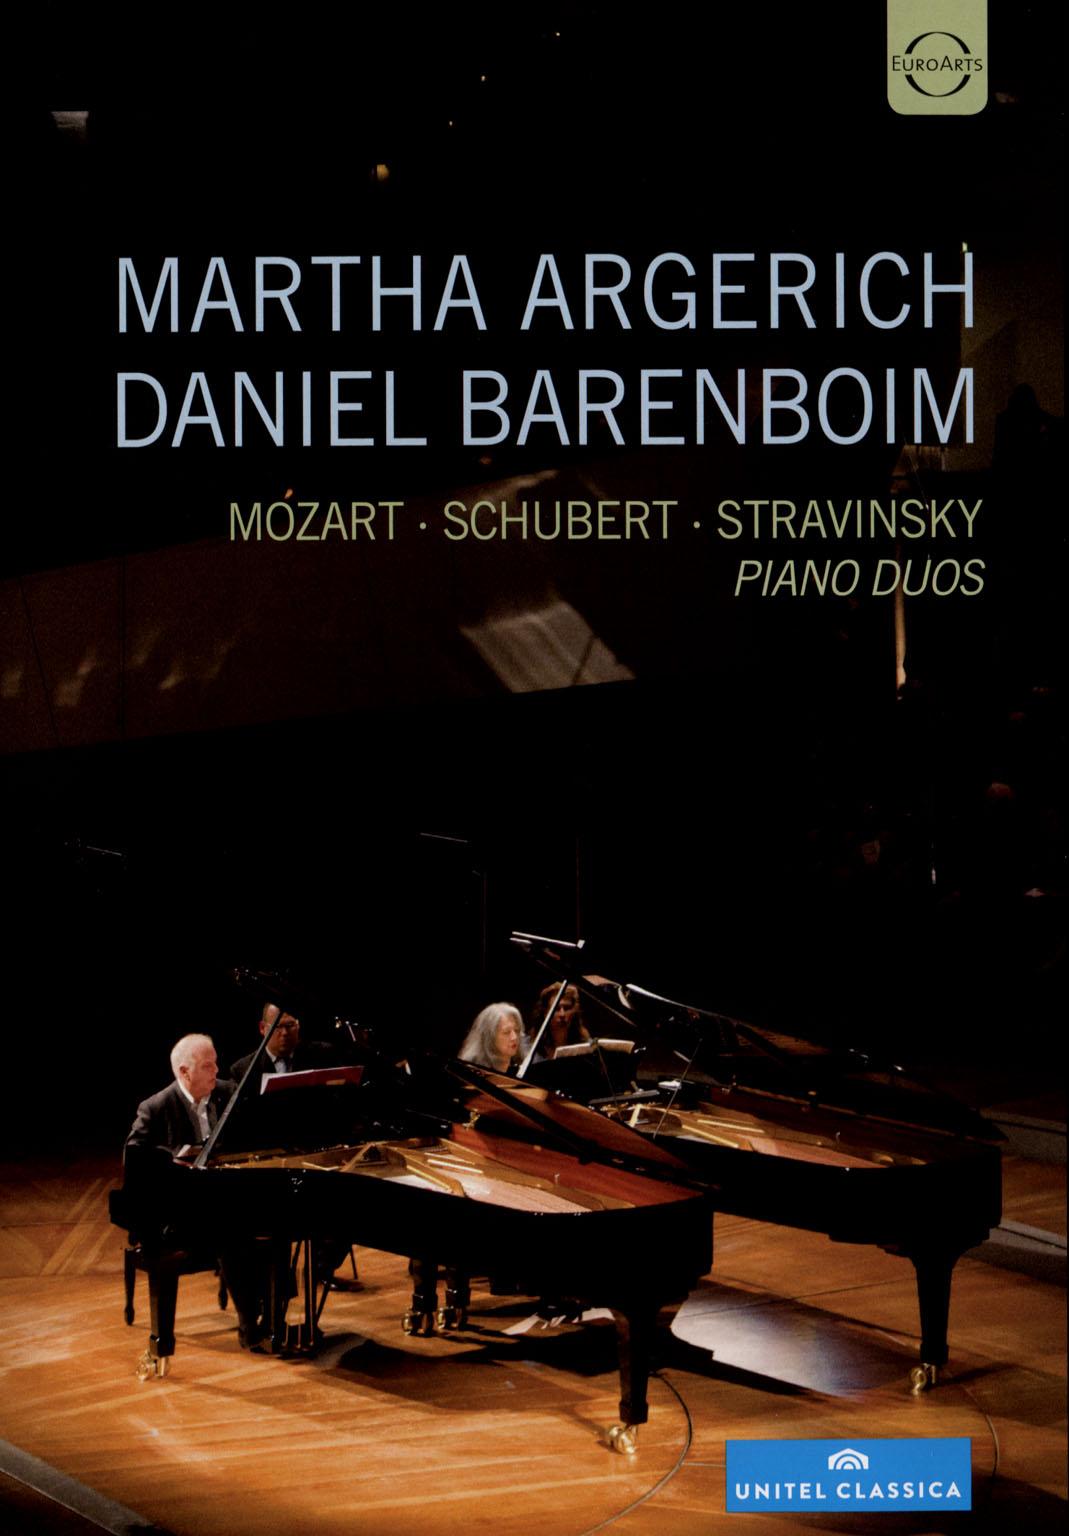 Martha Argerich/Daniel Barenboim: Mozart/Schubert/Stravinsky - Piano Duos